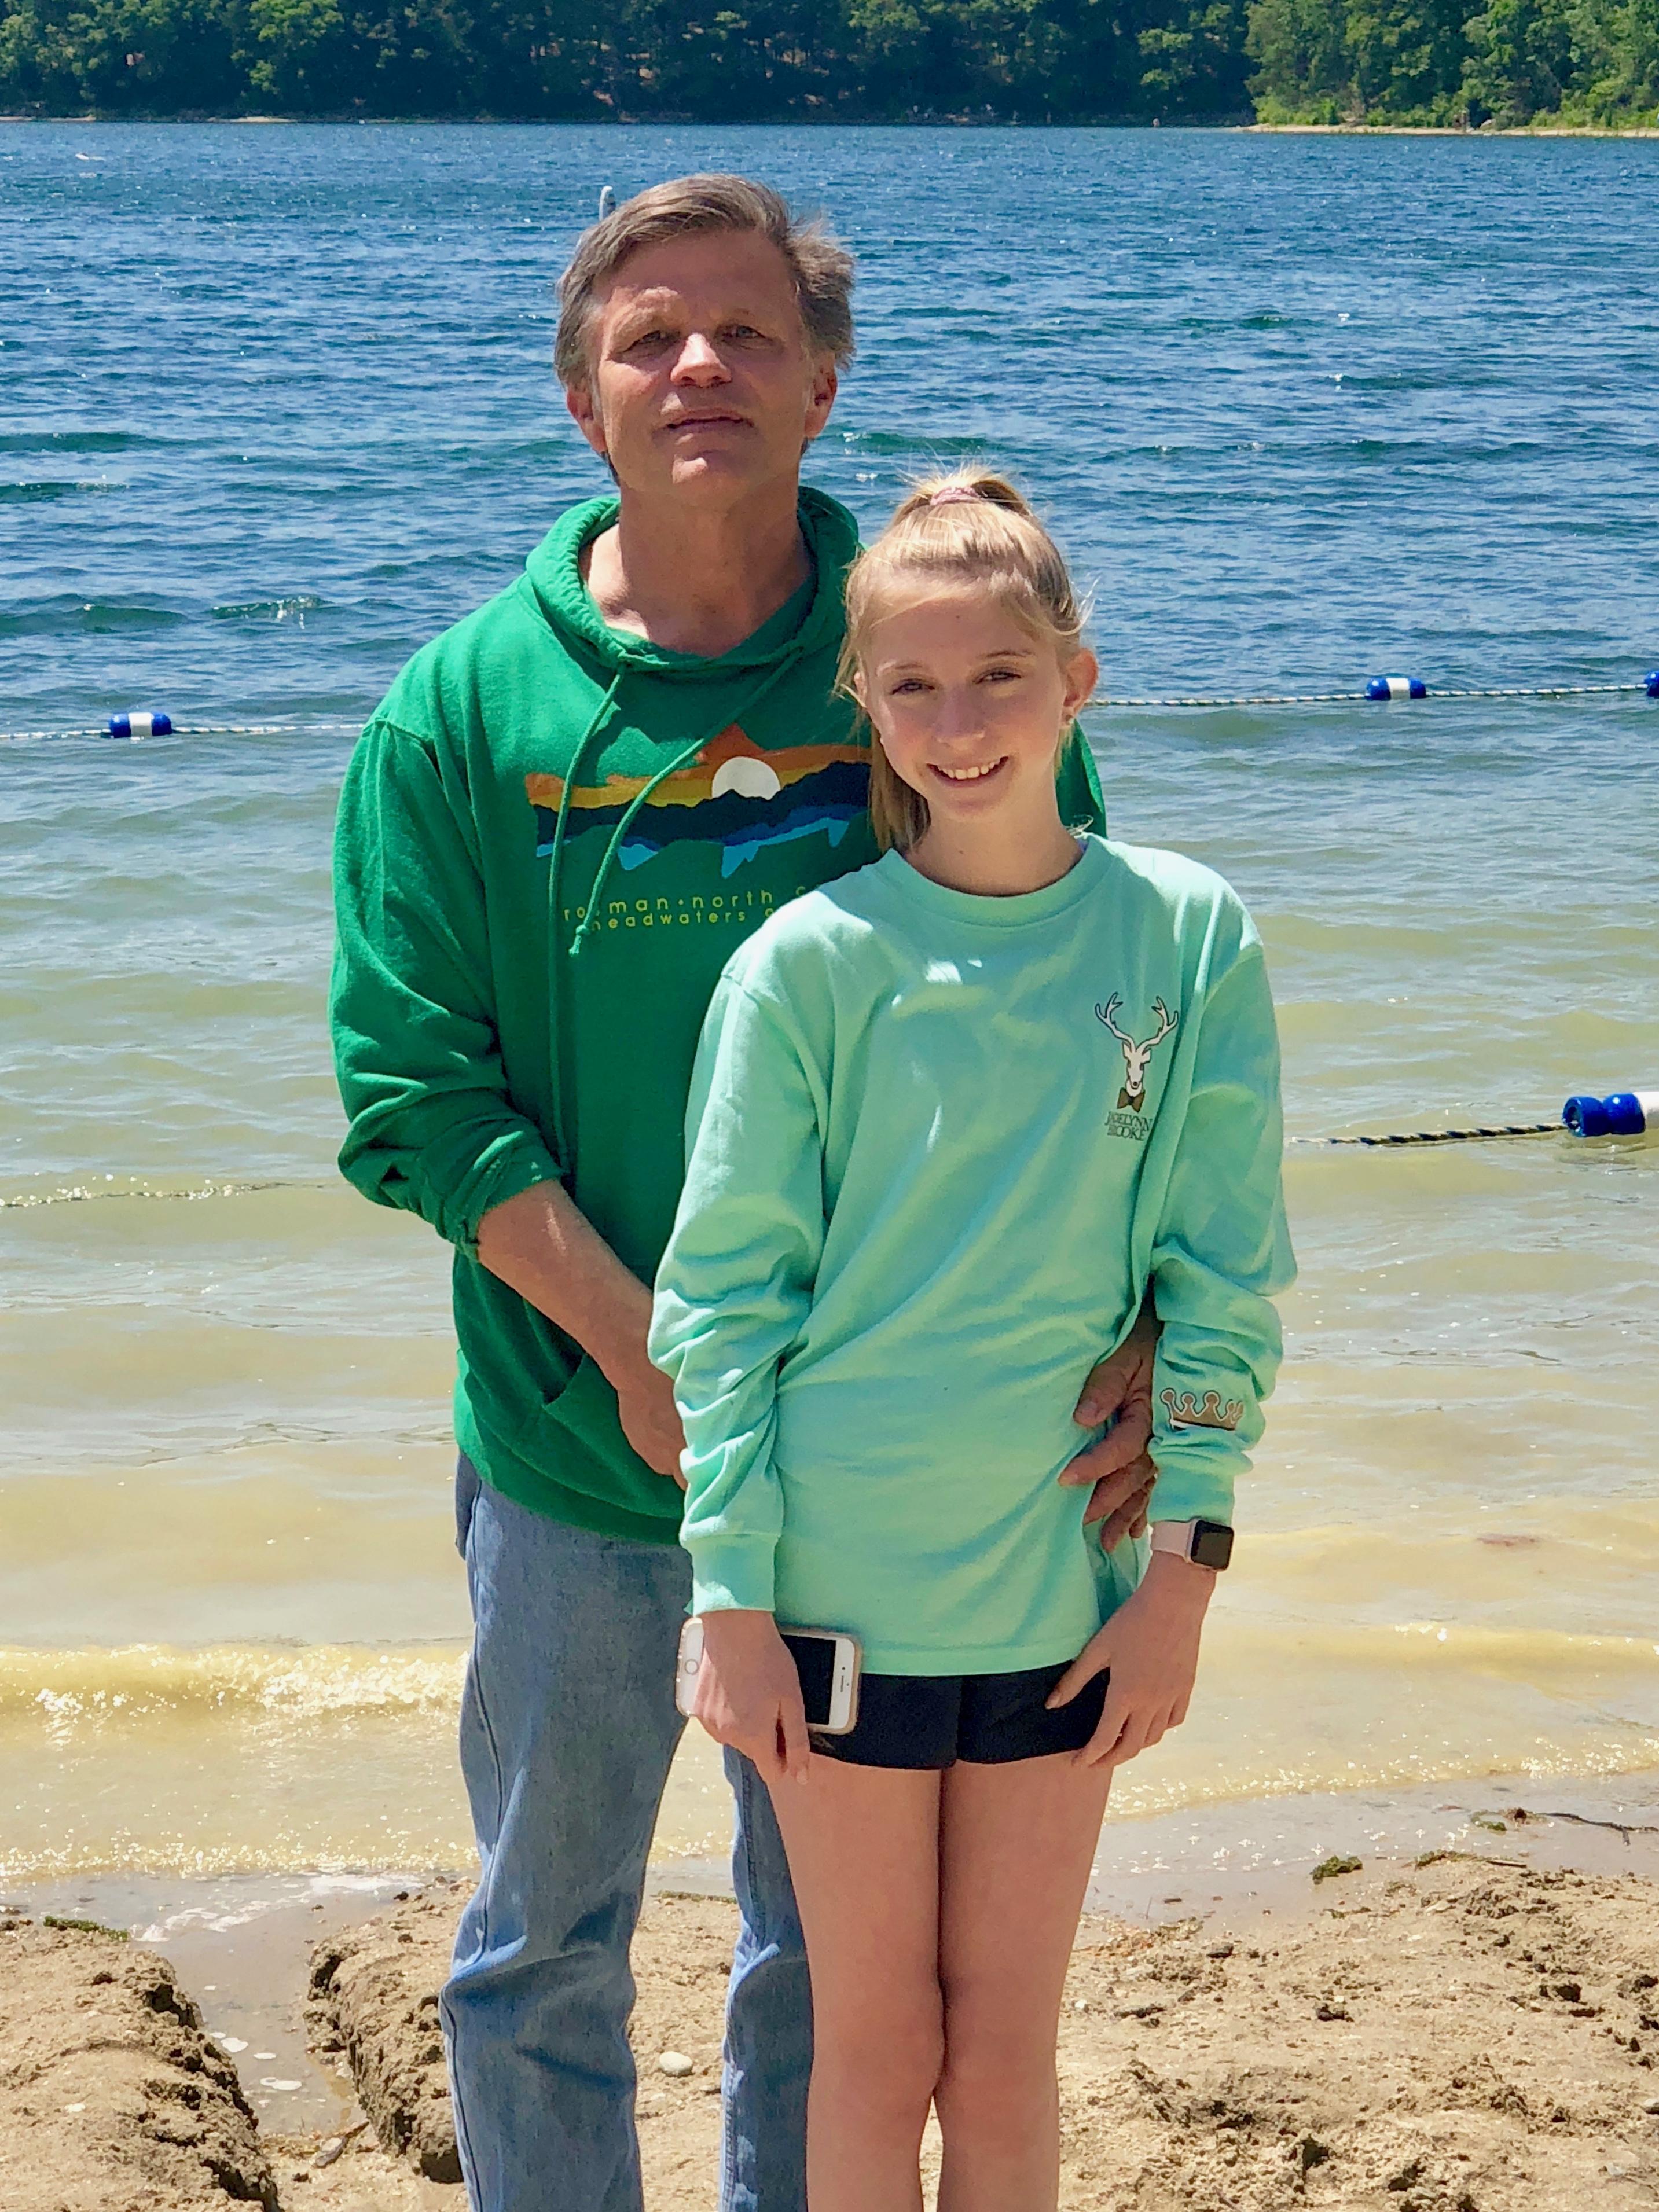 Douglas Brinkley and daughter Cassady